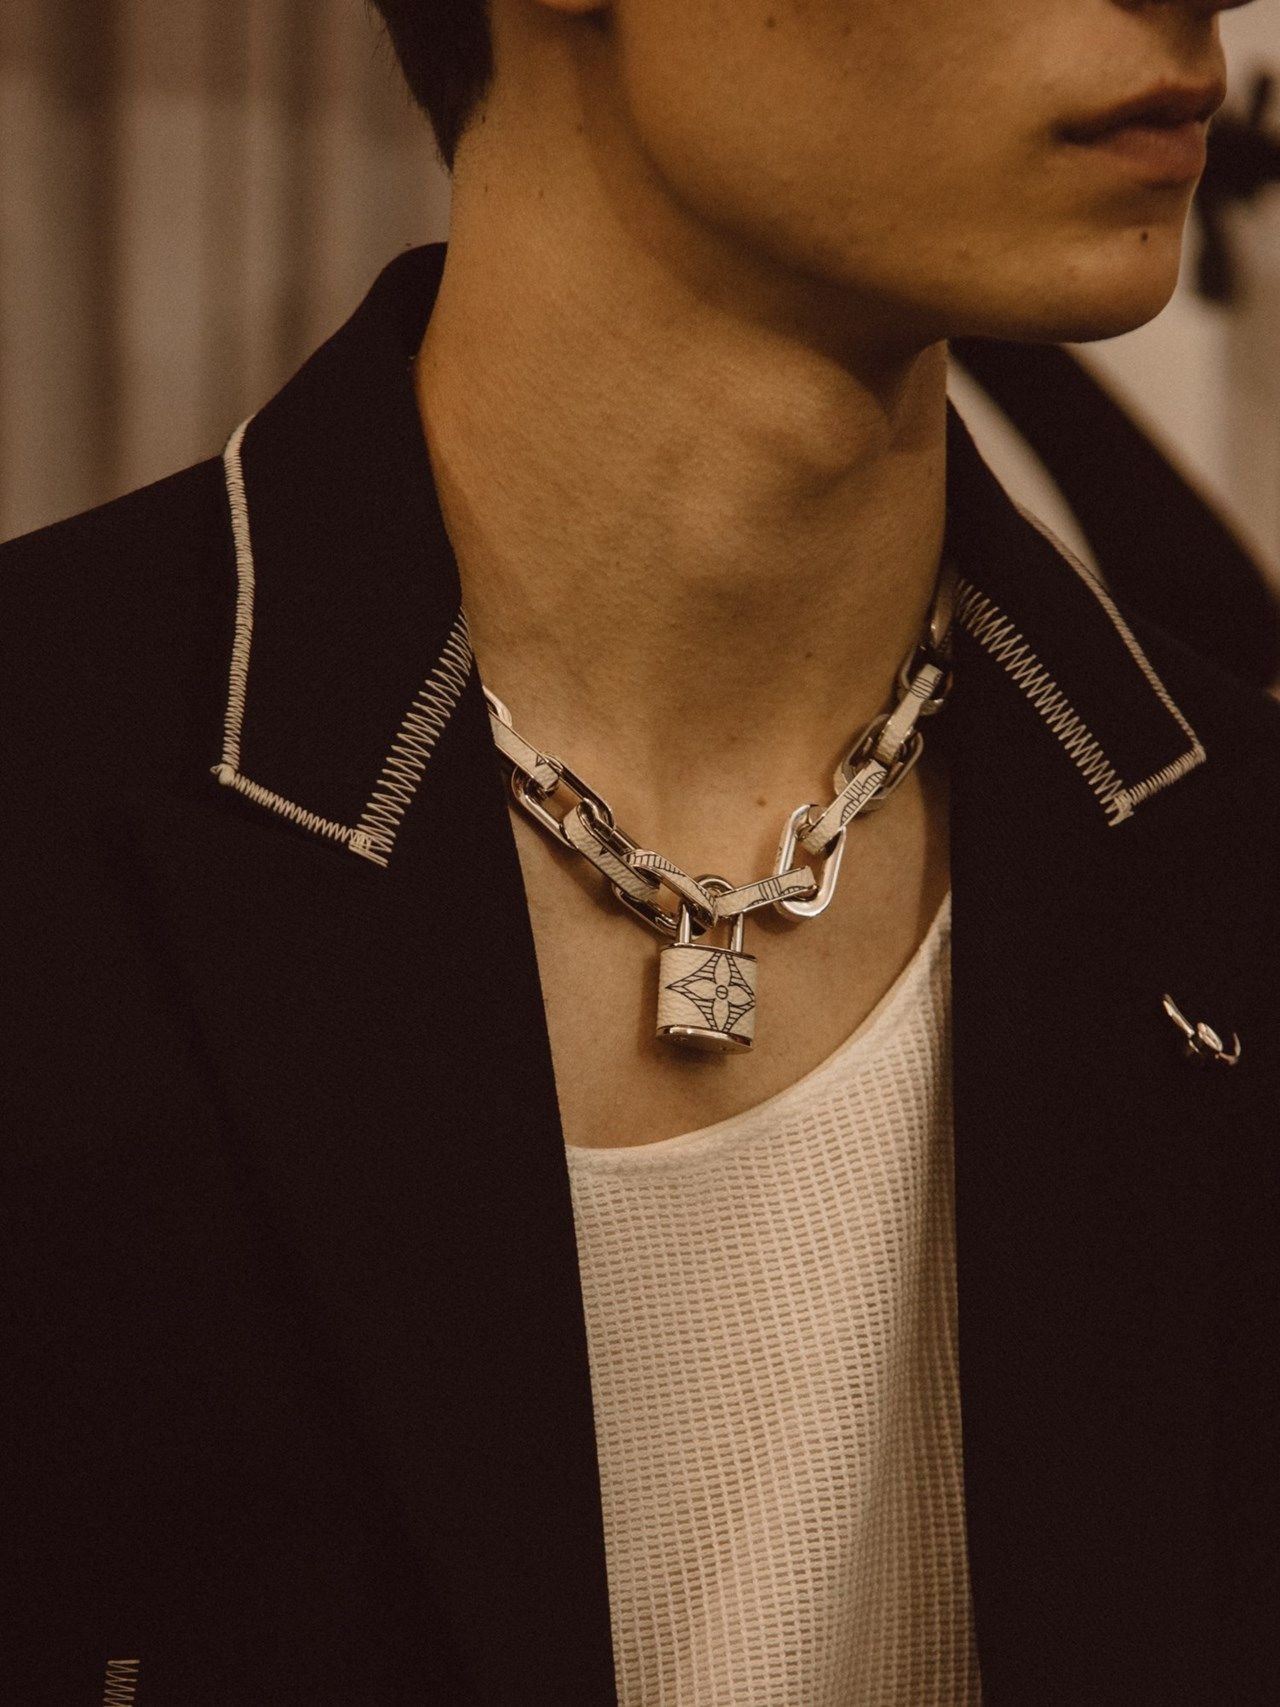 36+ Mens jewelry louis vuitton ideas